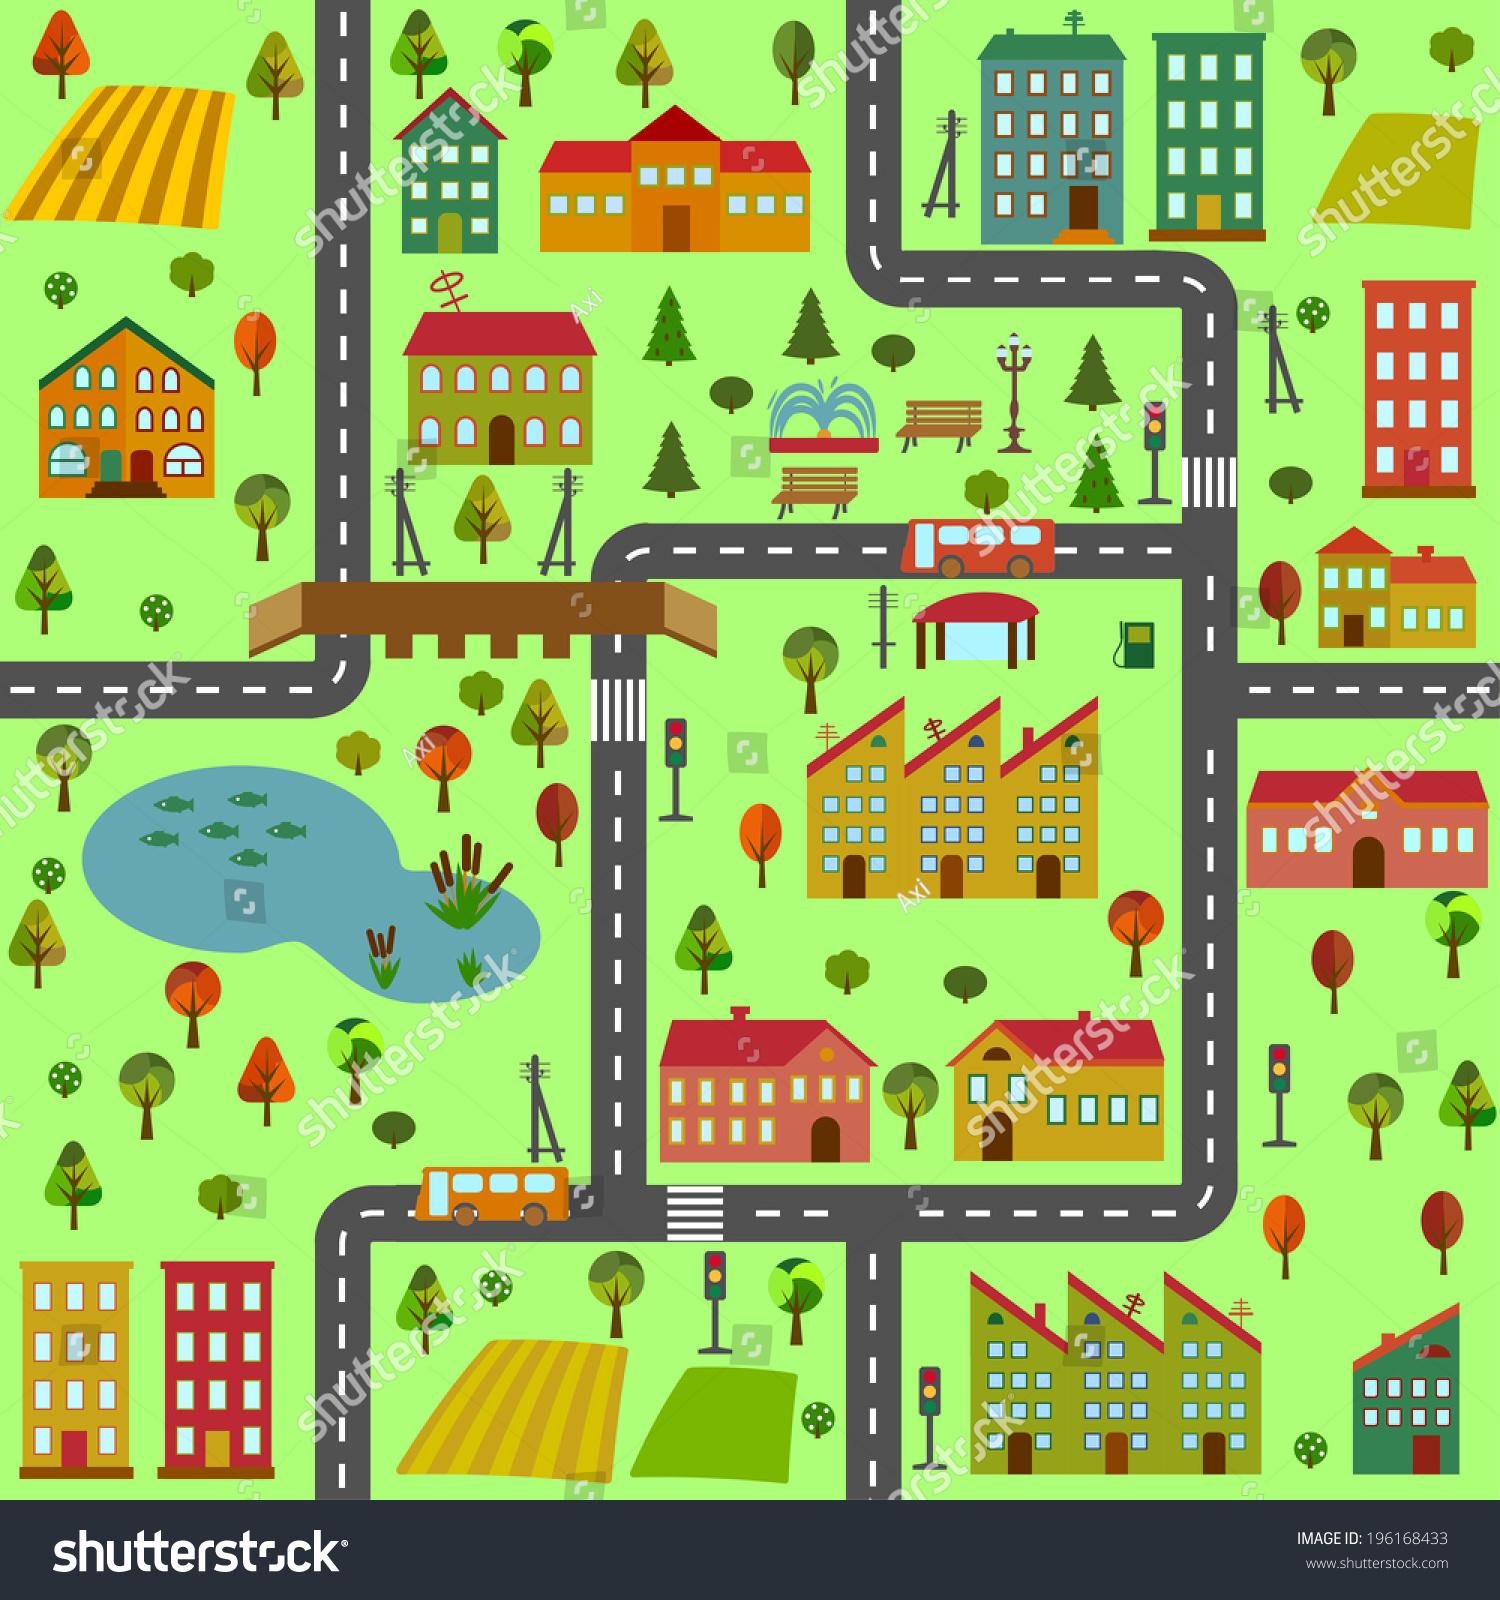 Cartoon Illustration Map City Different Houses Stock